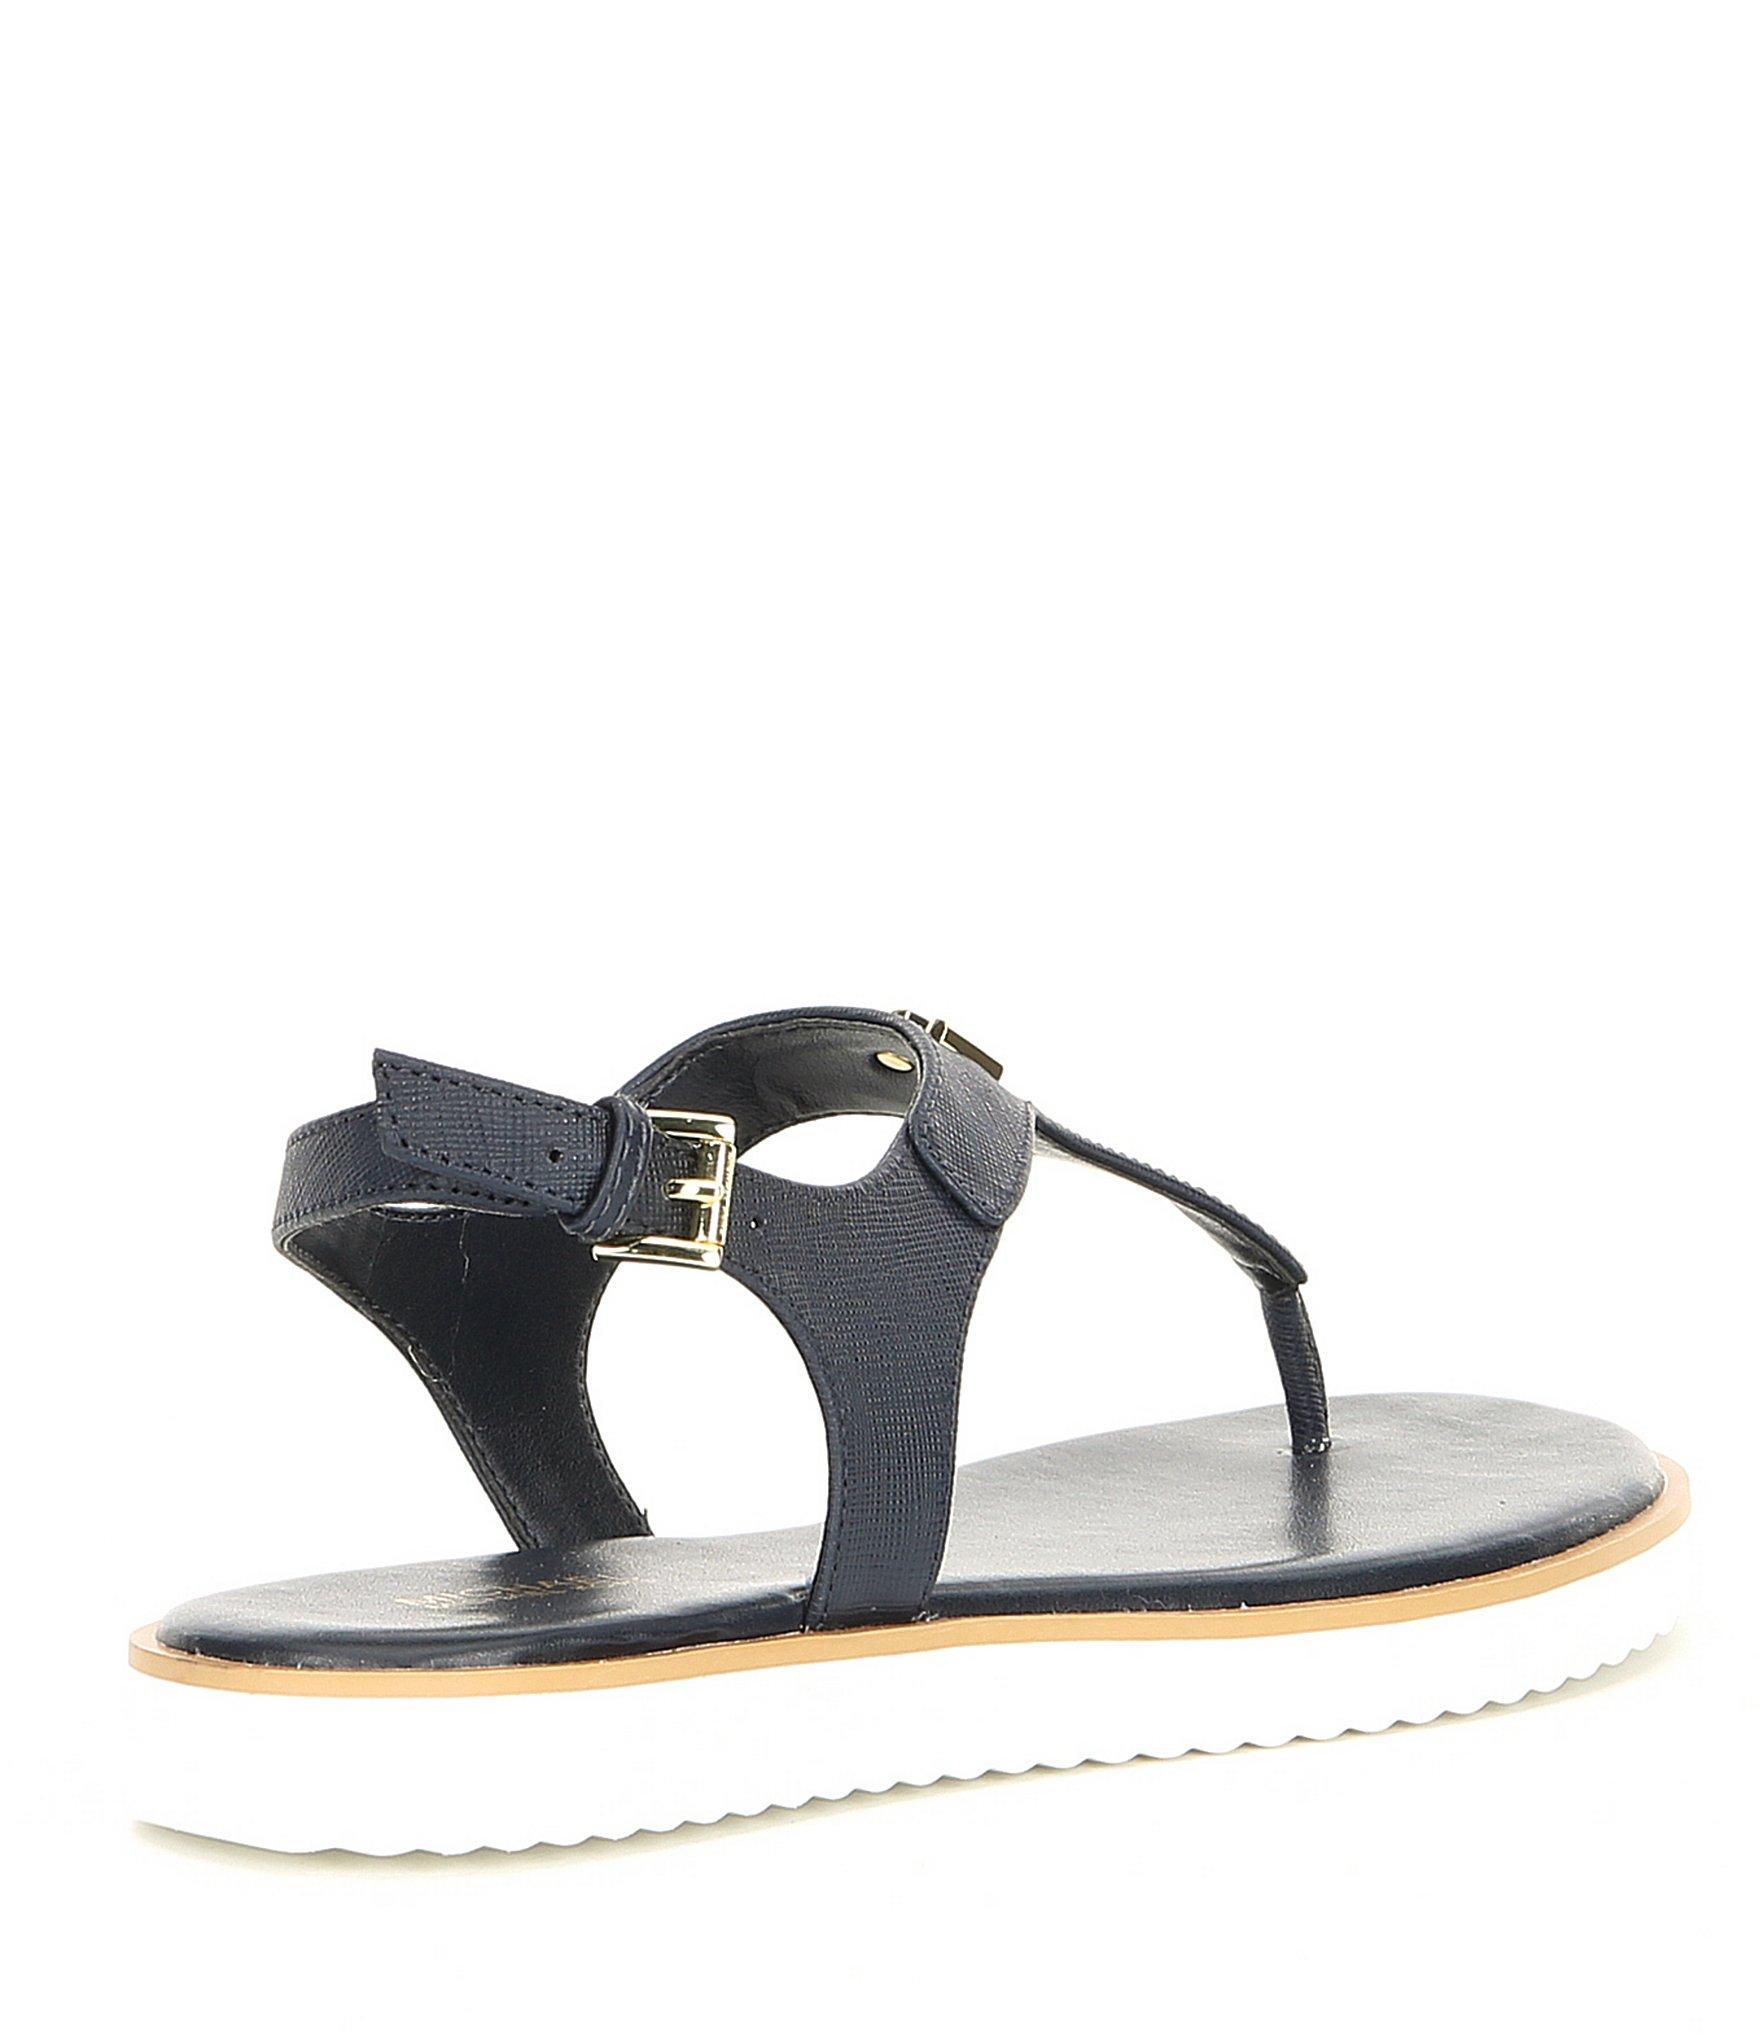 3c85a5db5f8 MICHAEL Michael Kors - Blue Brady Saffiano Leather Thong Sandals - Lyst.  View fullscreen